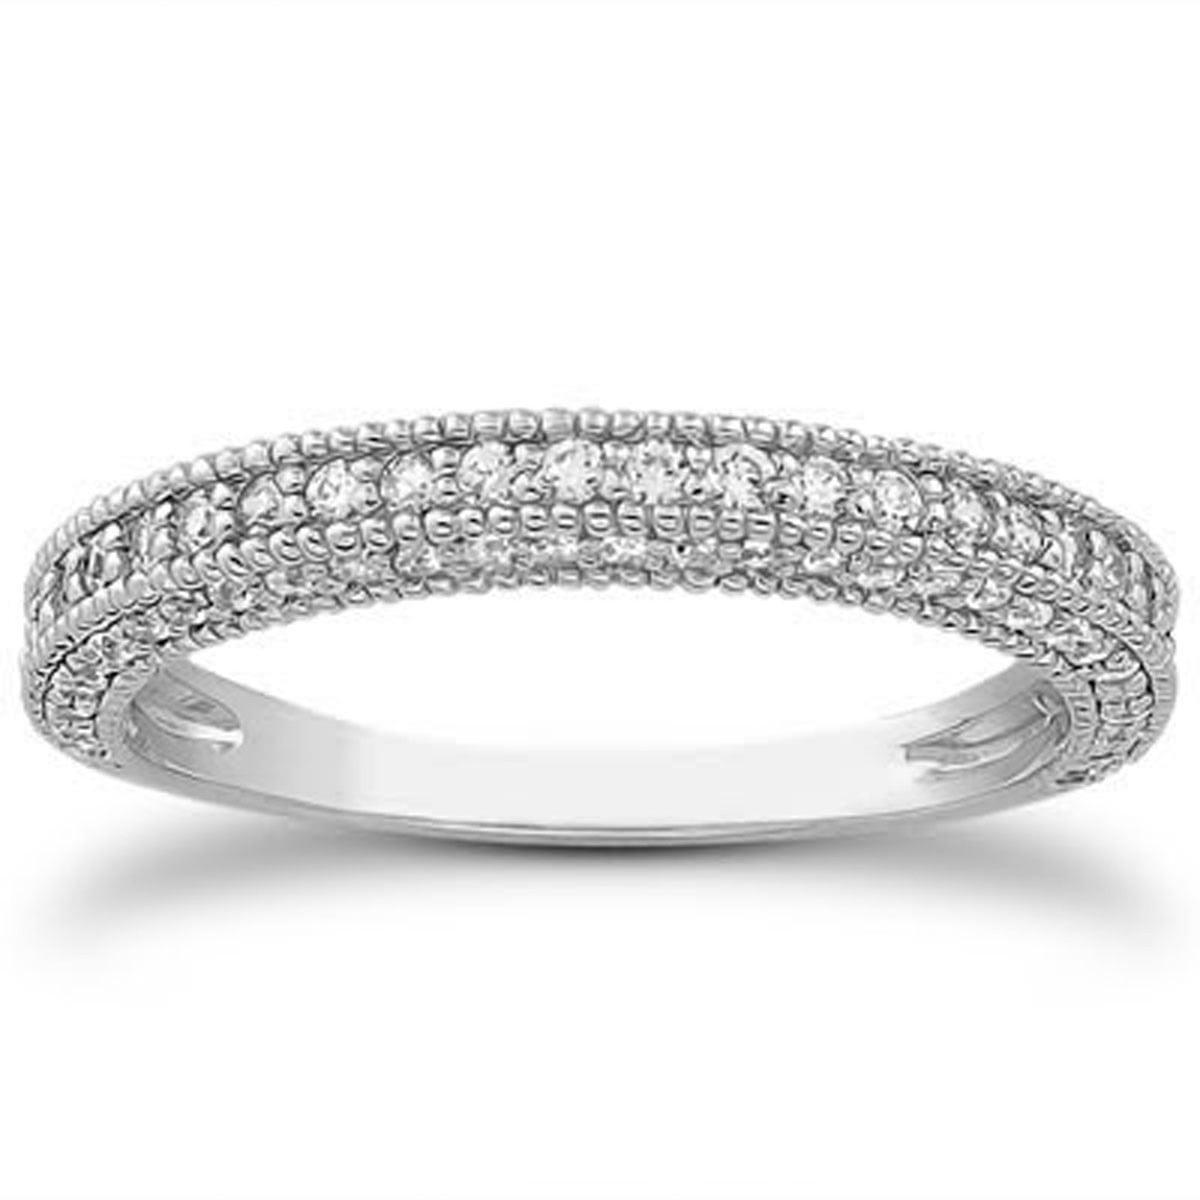 14K White Gold Fancy Pave Diamond Milgrain Textured Wedding Ring Band Size - 7